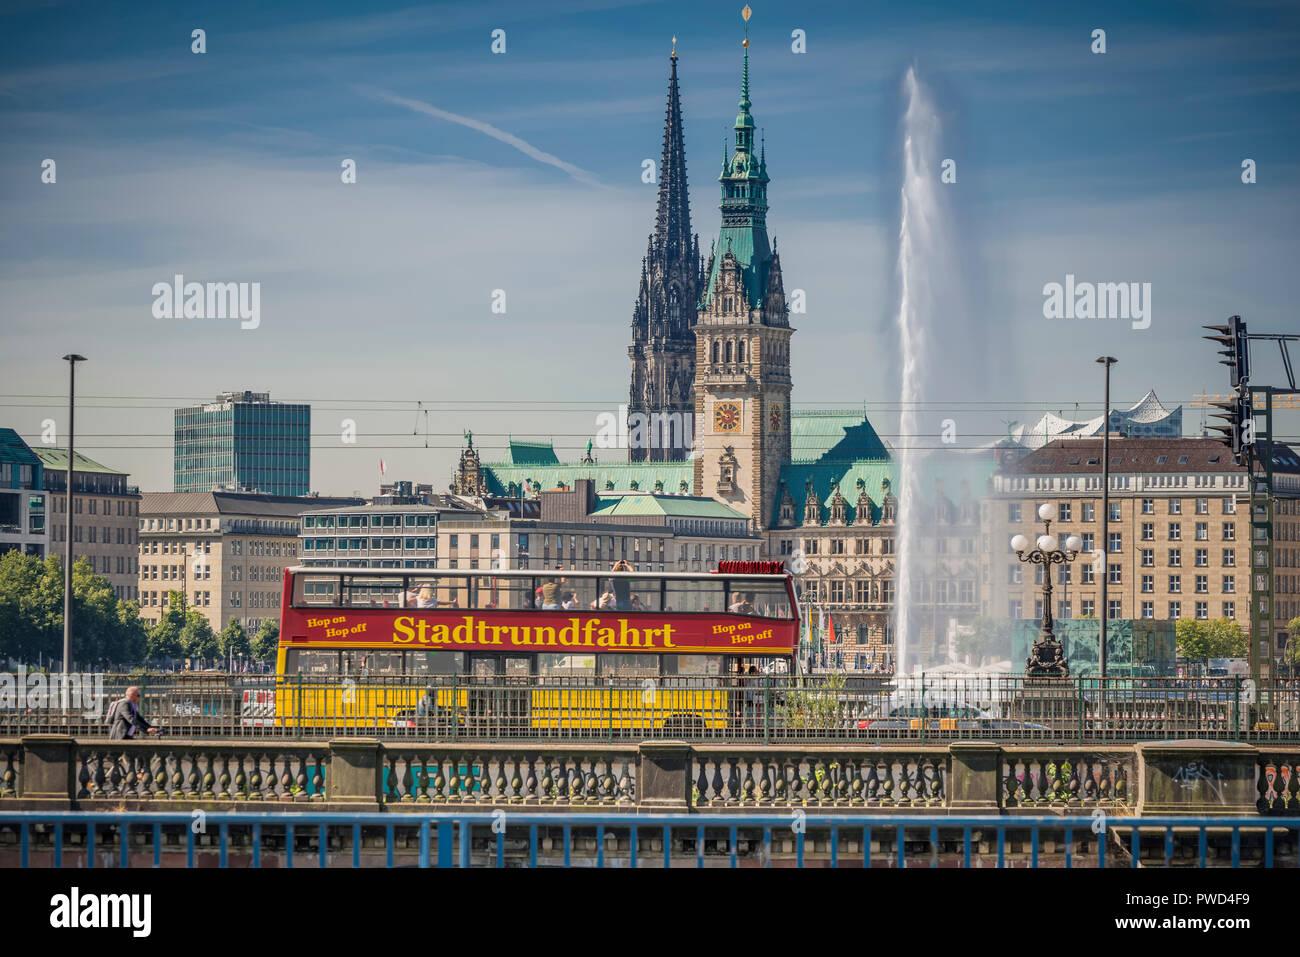 Deutschland, Hamburg, Alster, Rathaus, Nikolaikirche, Binnenalster Stockbild